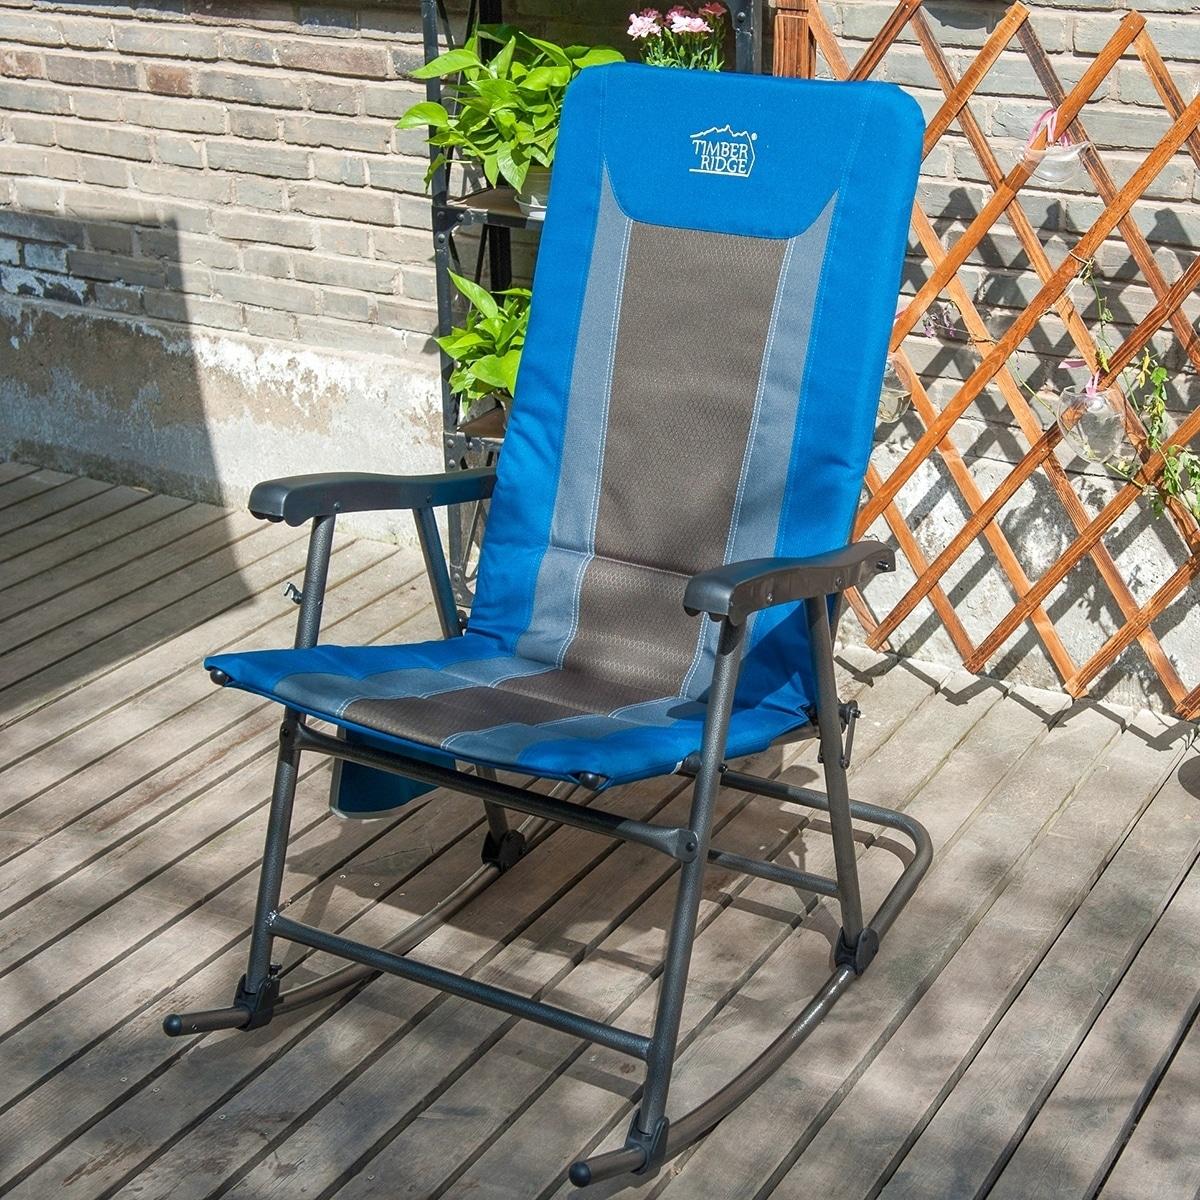 Rocking Chair Timber Ridge Chairs